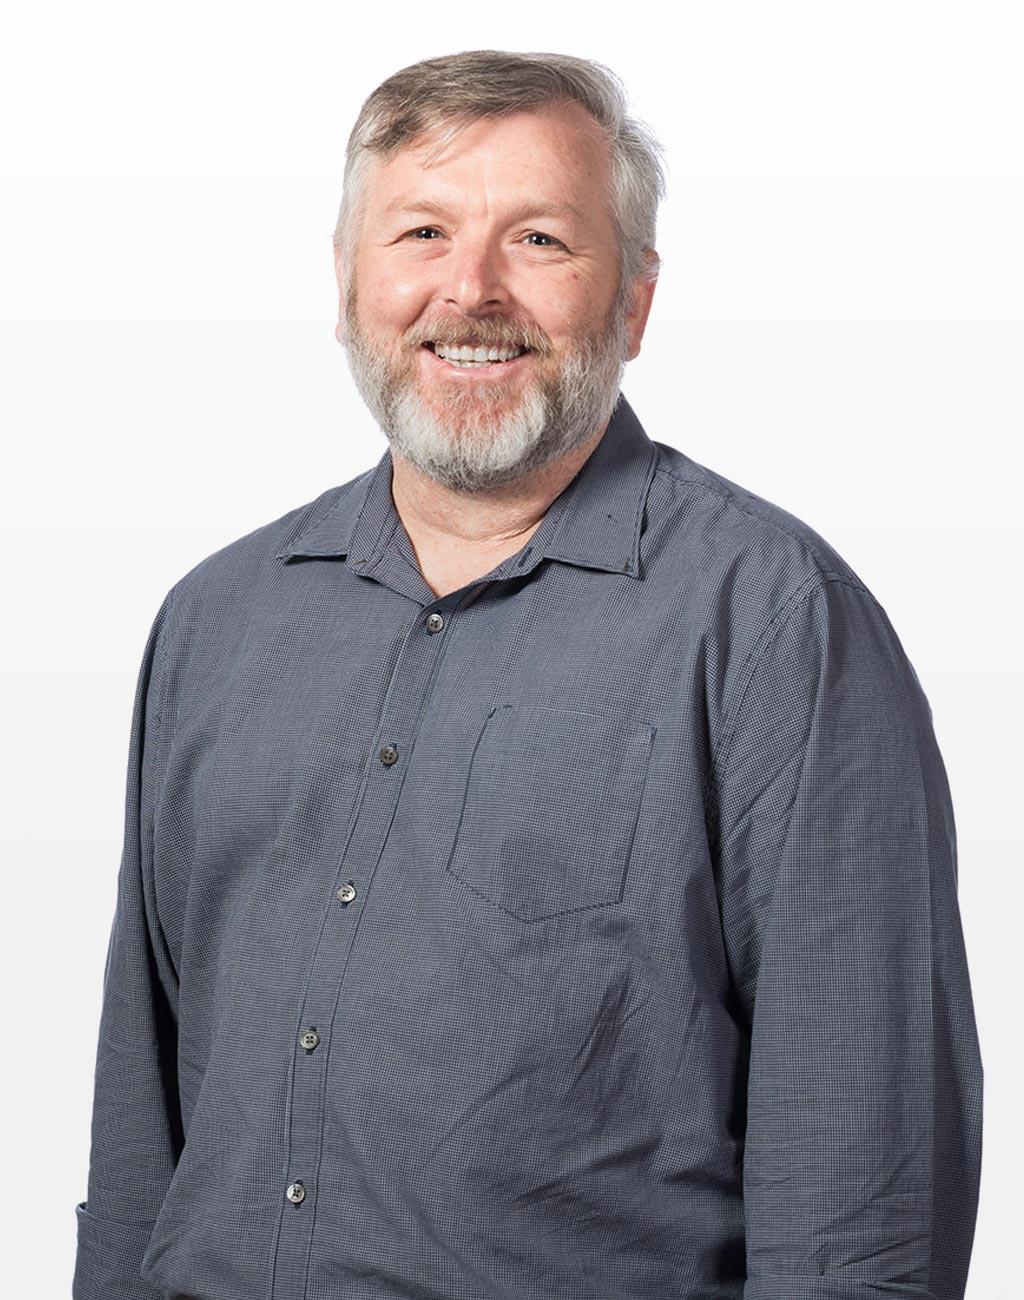 John McCrystal